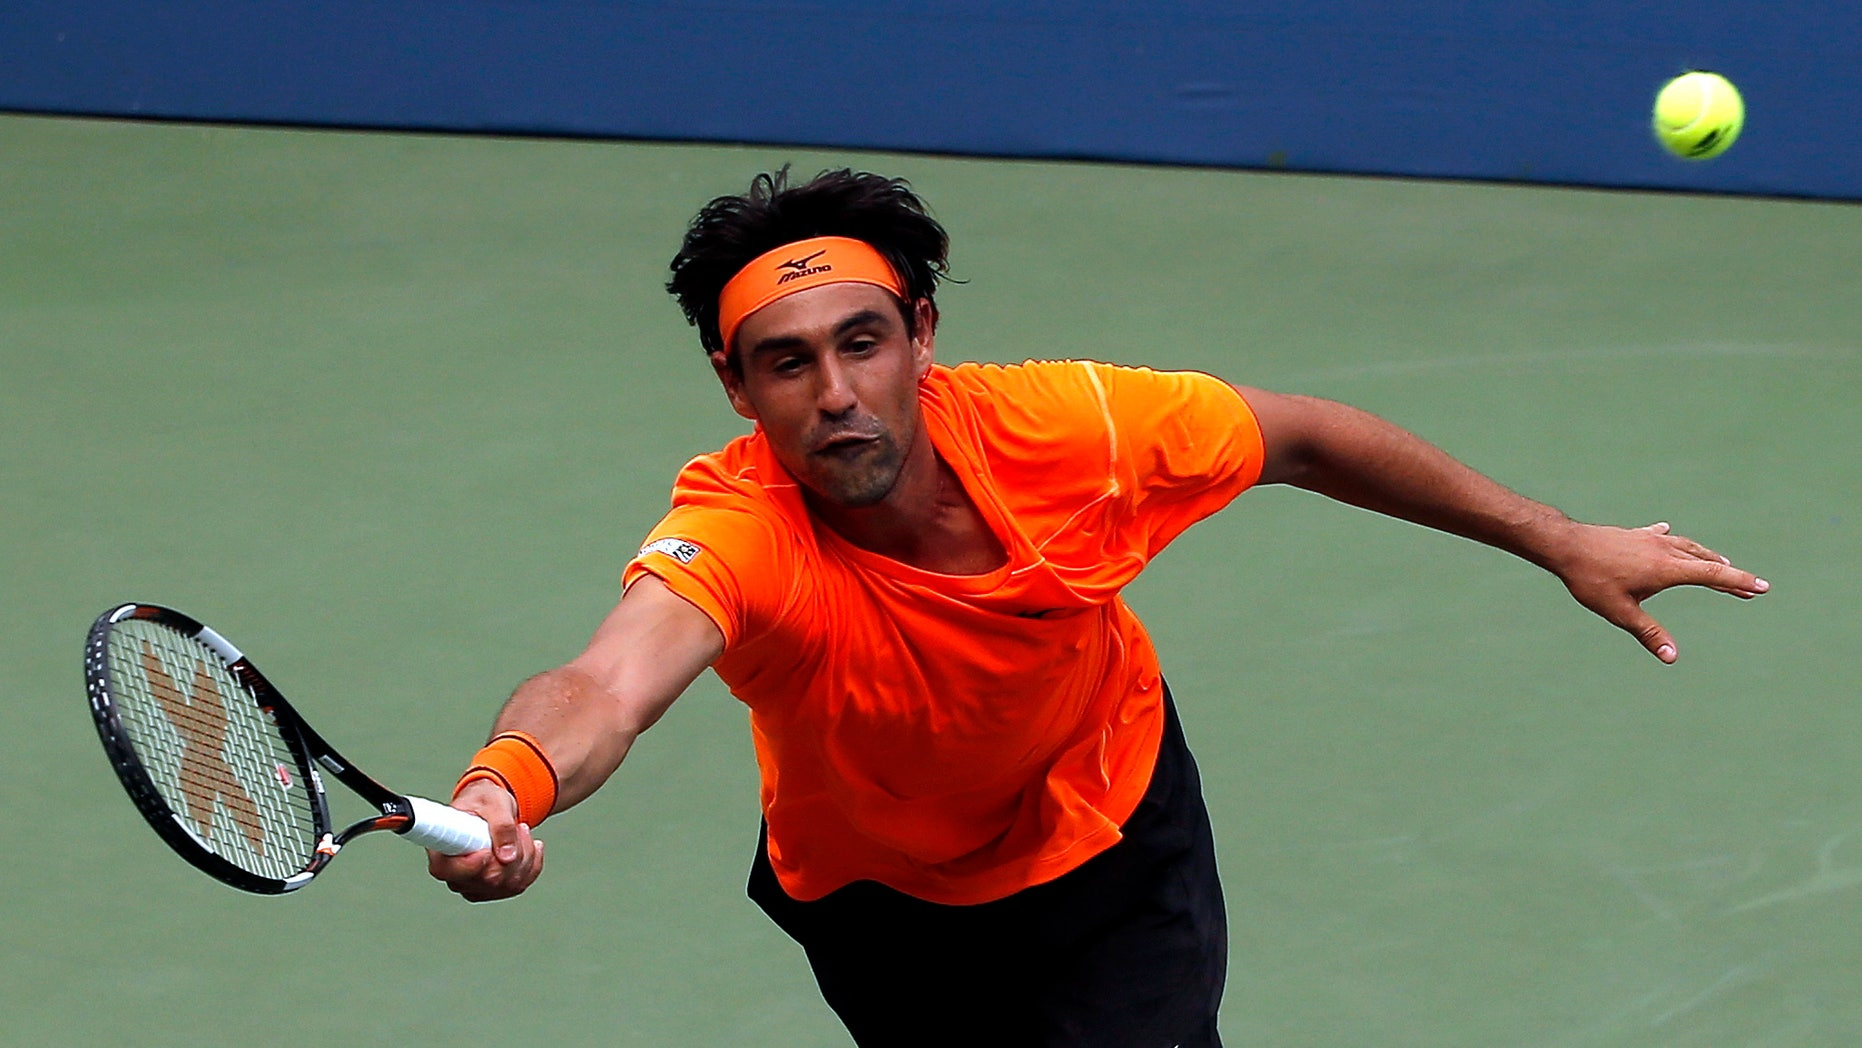 Marcos Baghdatis returns a shot at the U.S. Open.